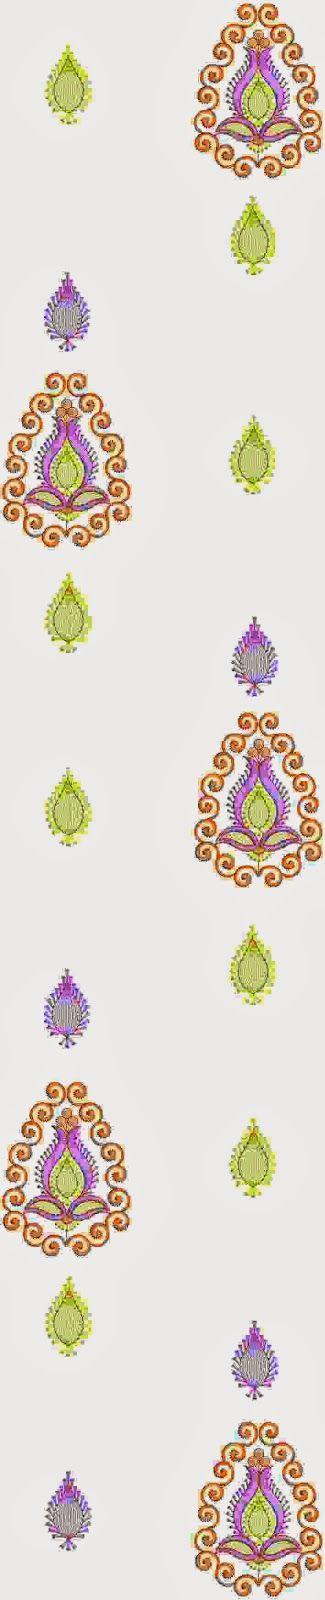 netto uitgeroep Multi Sari